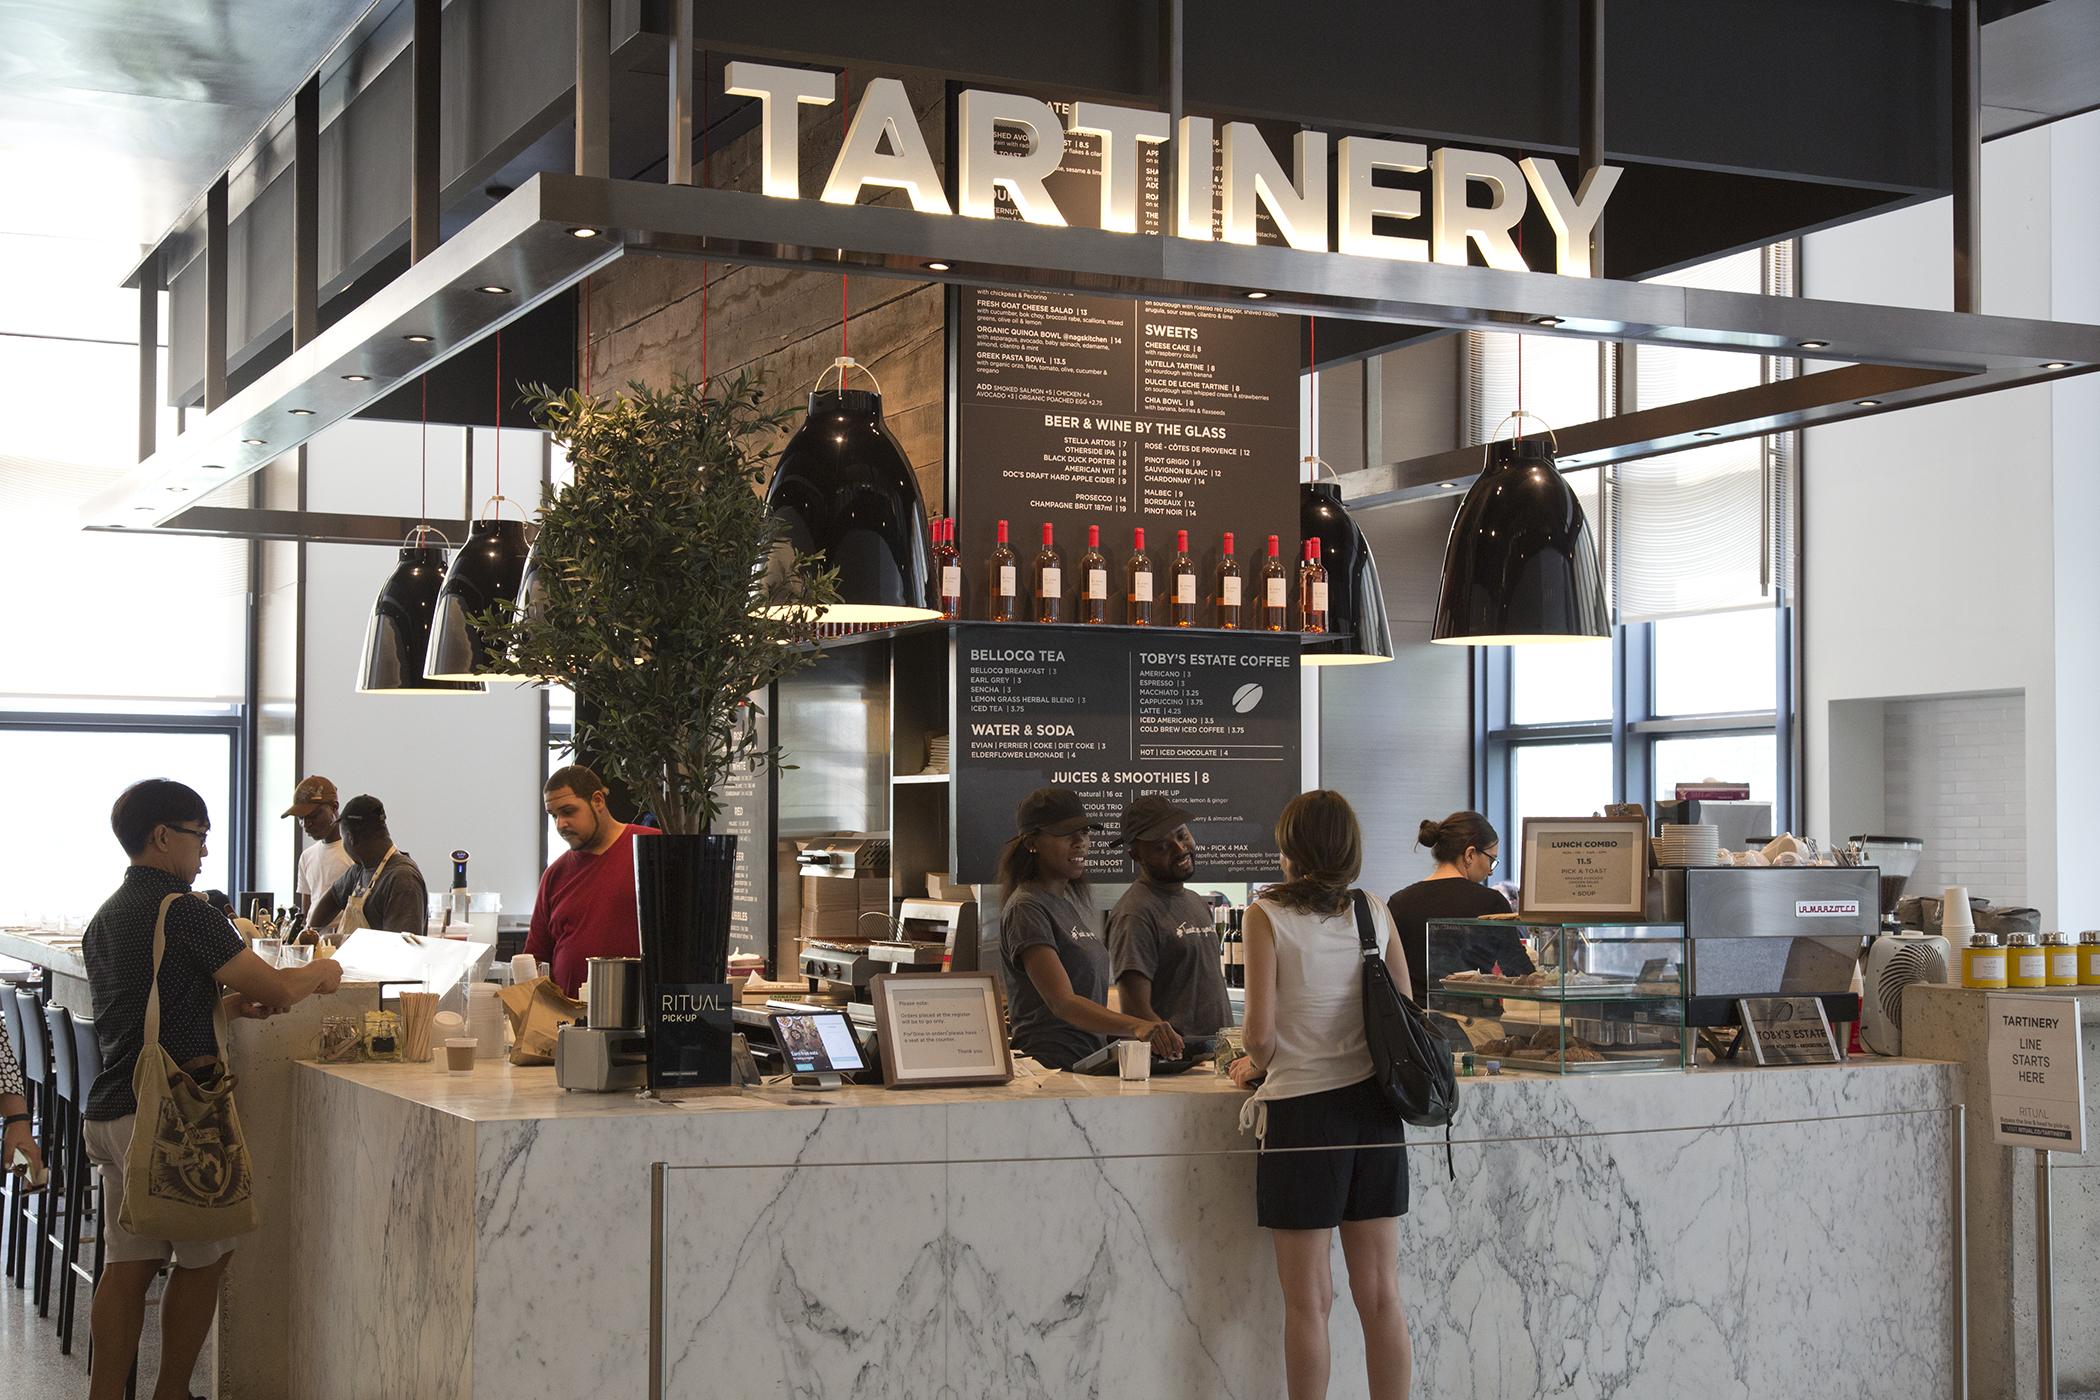 Tartinery restaurant inside of Hudson Eats food court, Brookfield Place.